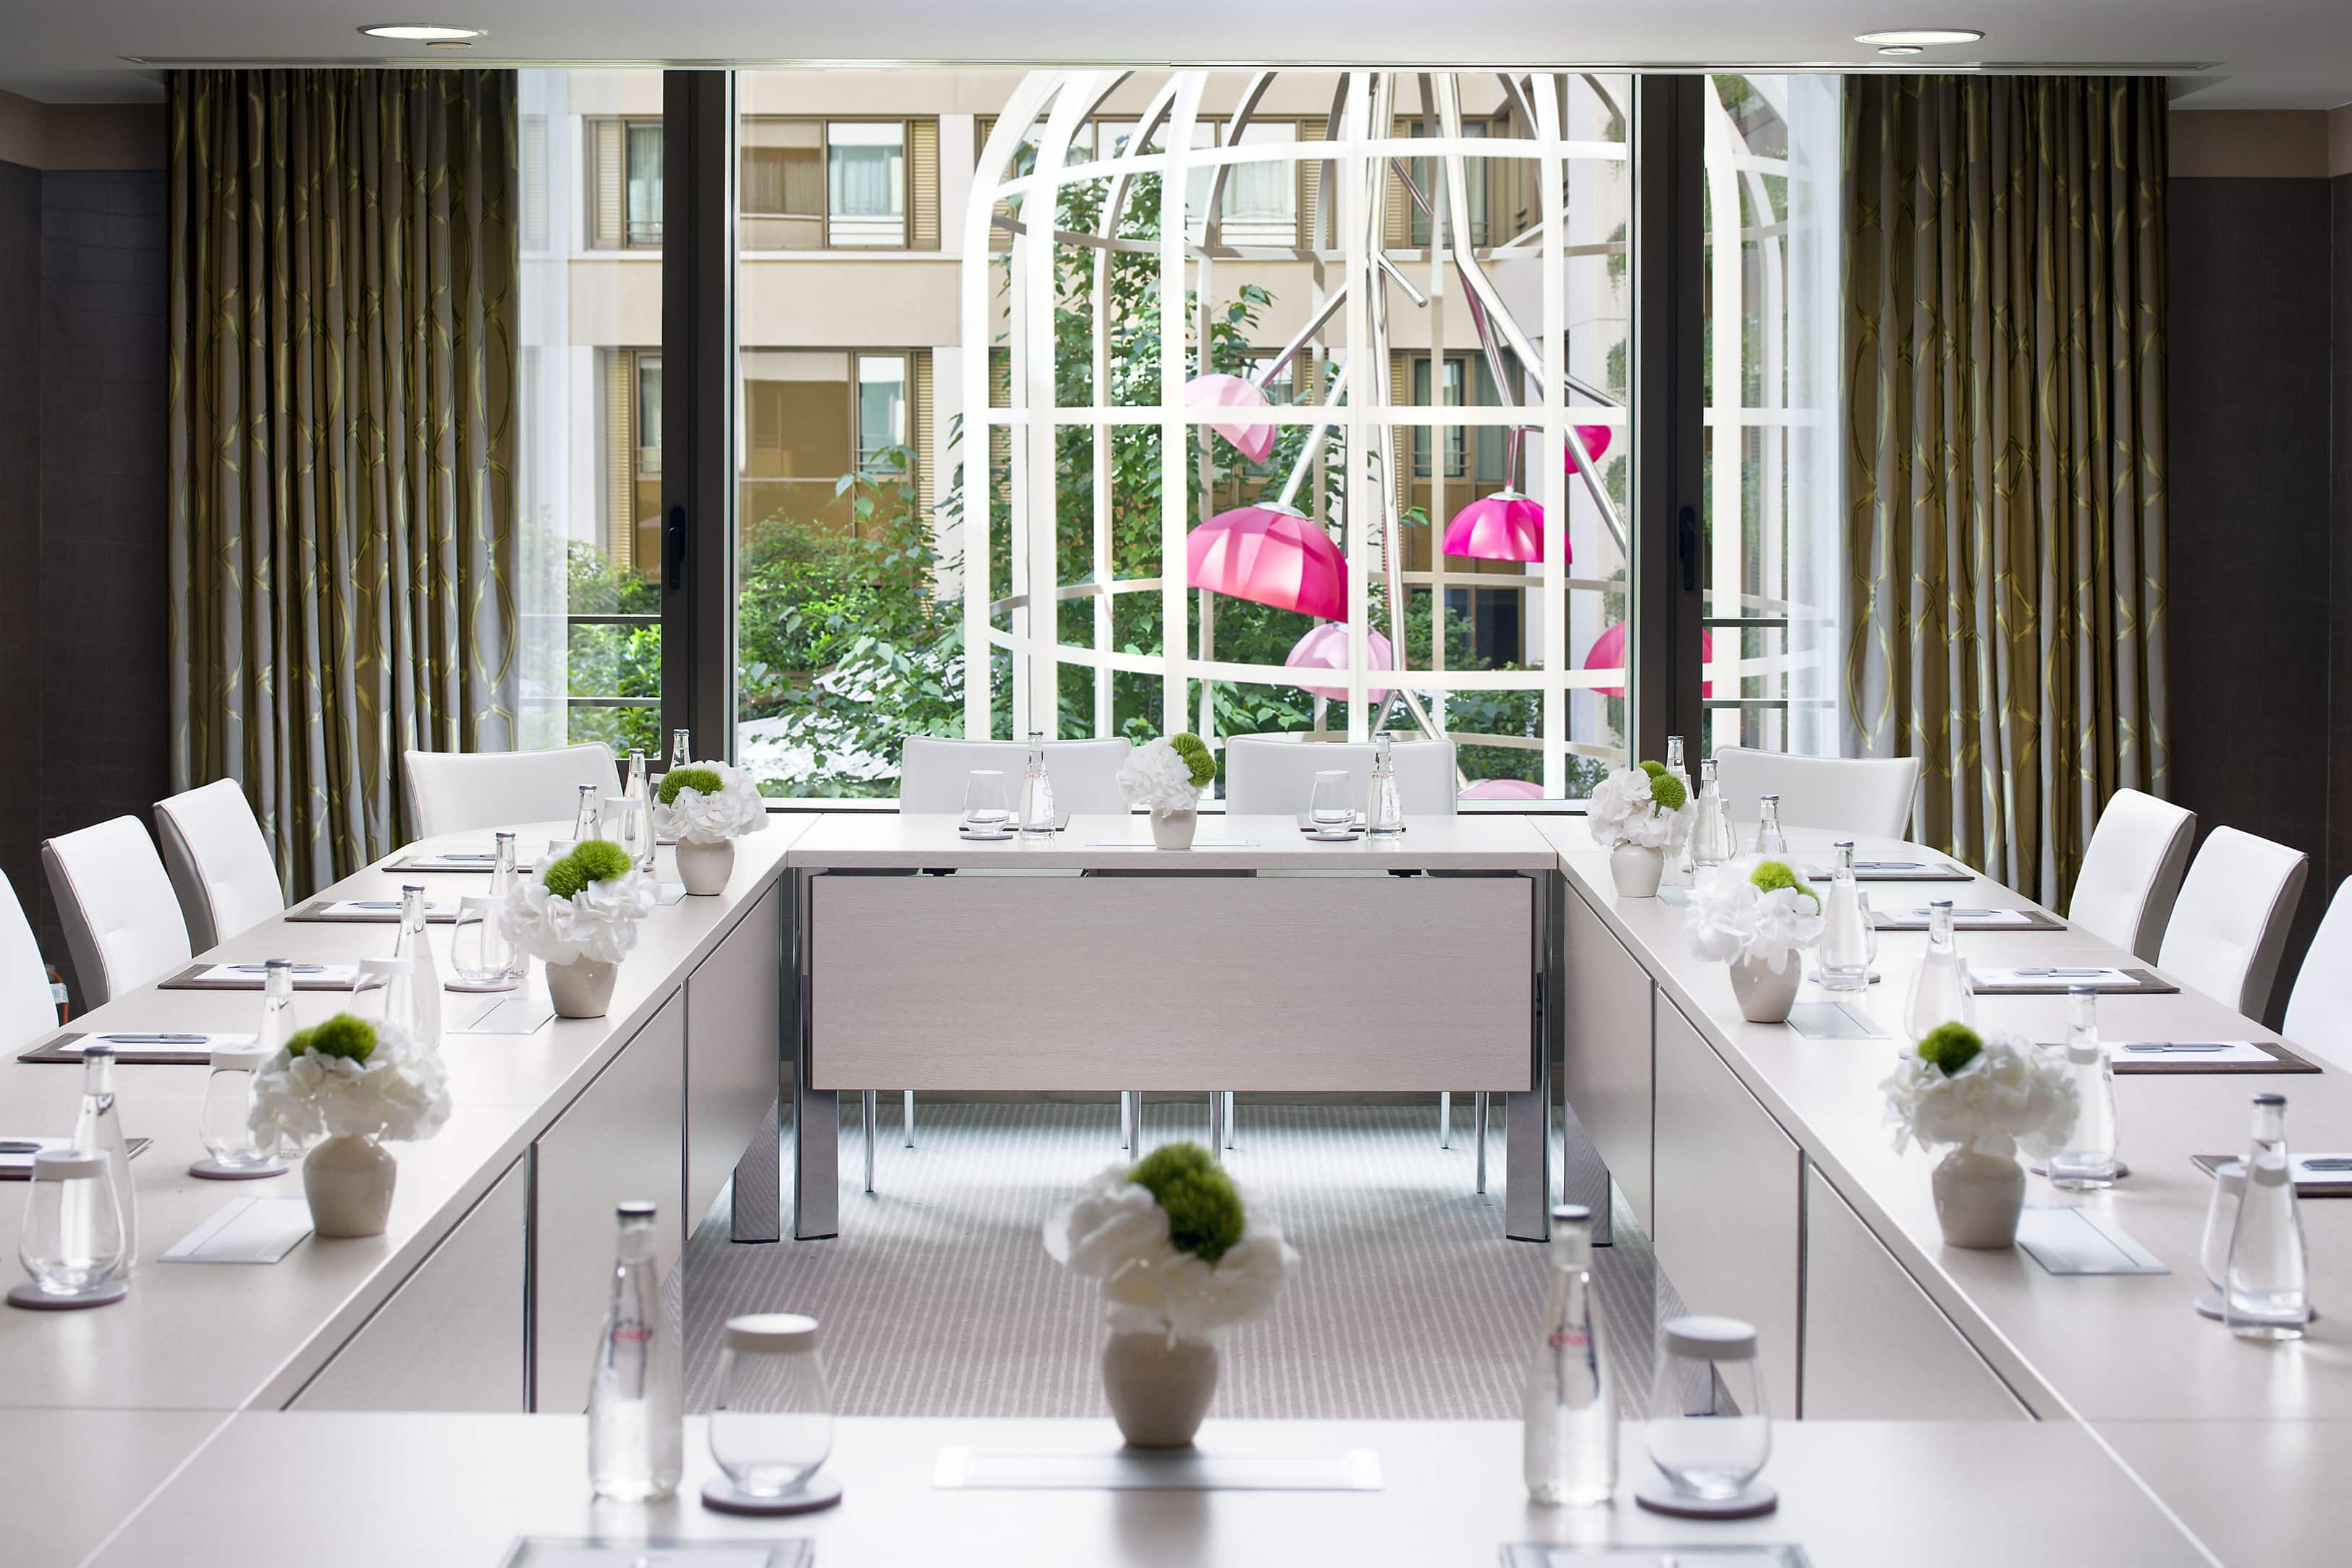 fotogalerie des hotels in paris mandarin oriental hotel paris. Black Bedroom Furniture Sets. Home Design Ideas